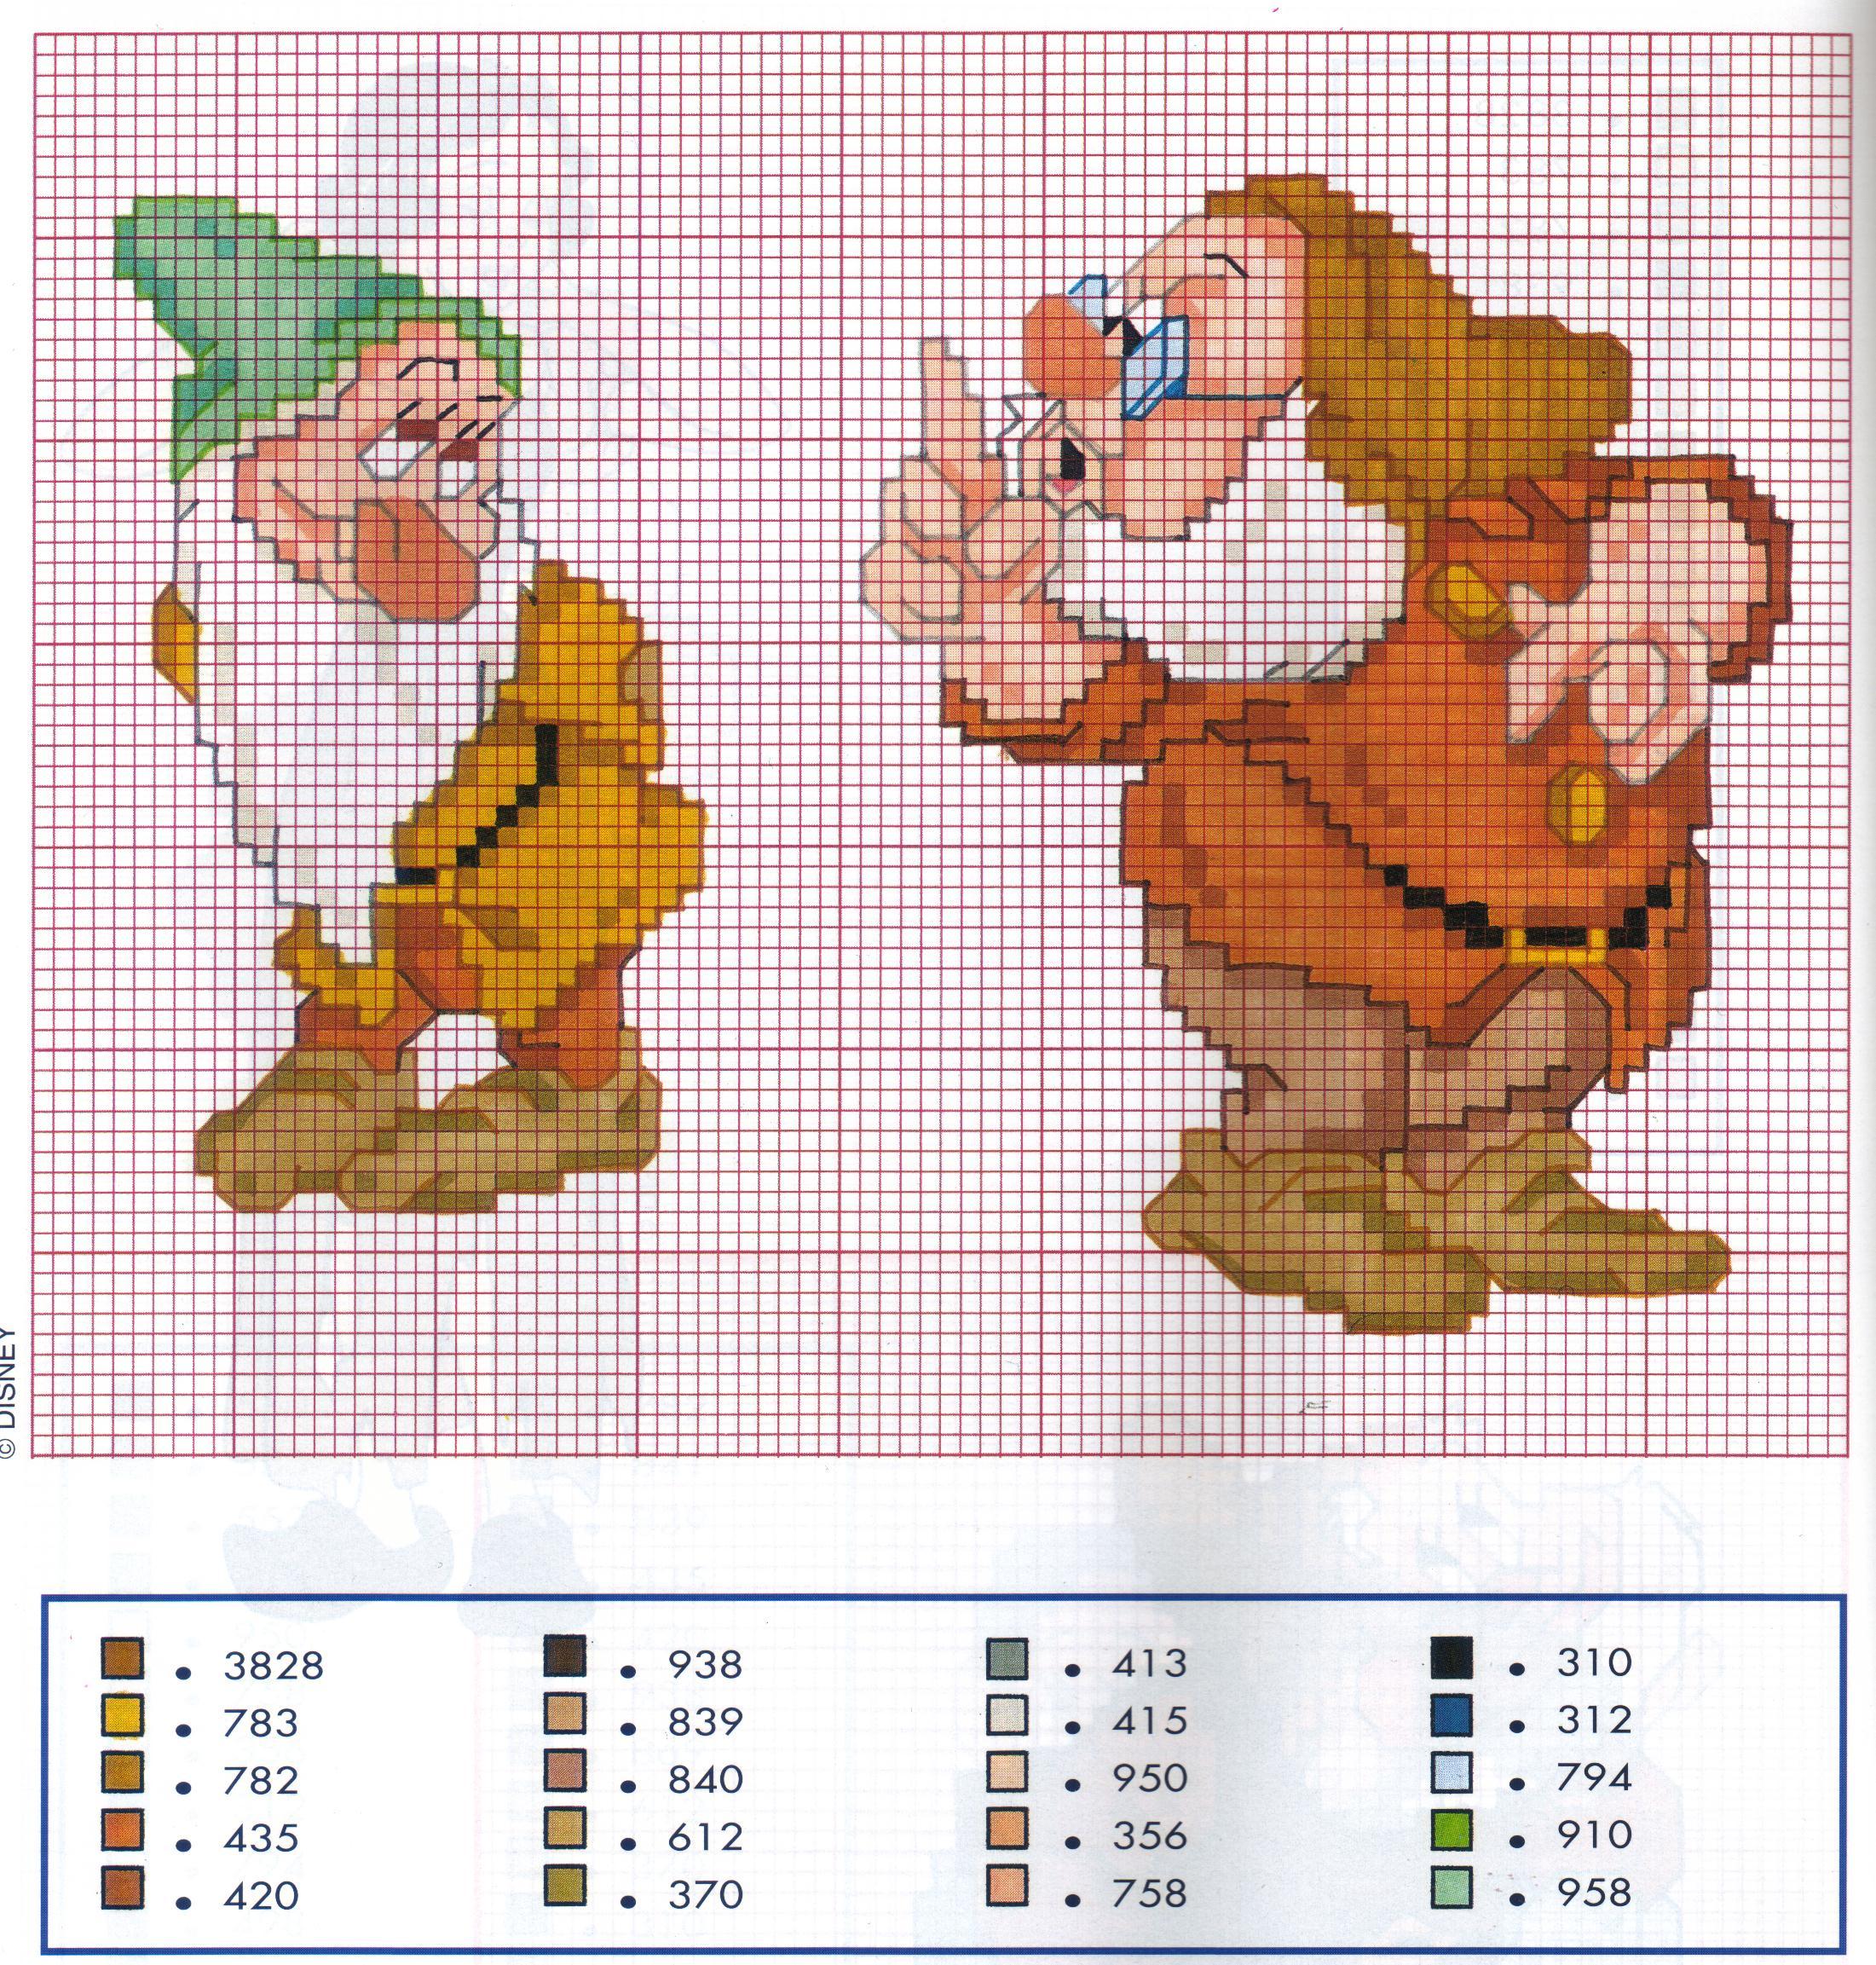 schemi_misti/cartoni_animati/schemi_cartoni_animati_159.jpg